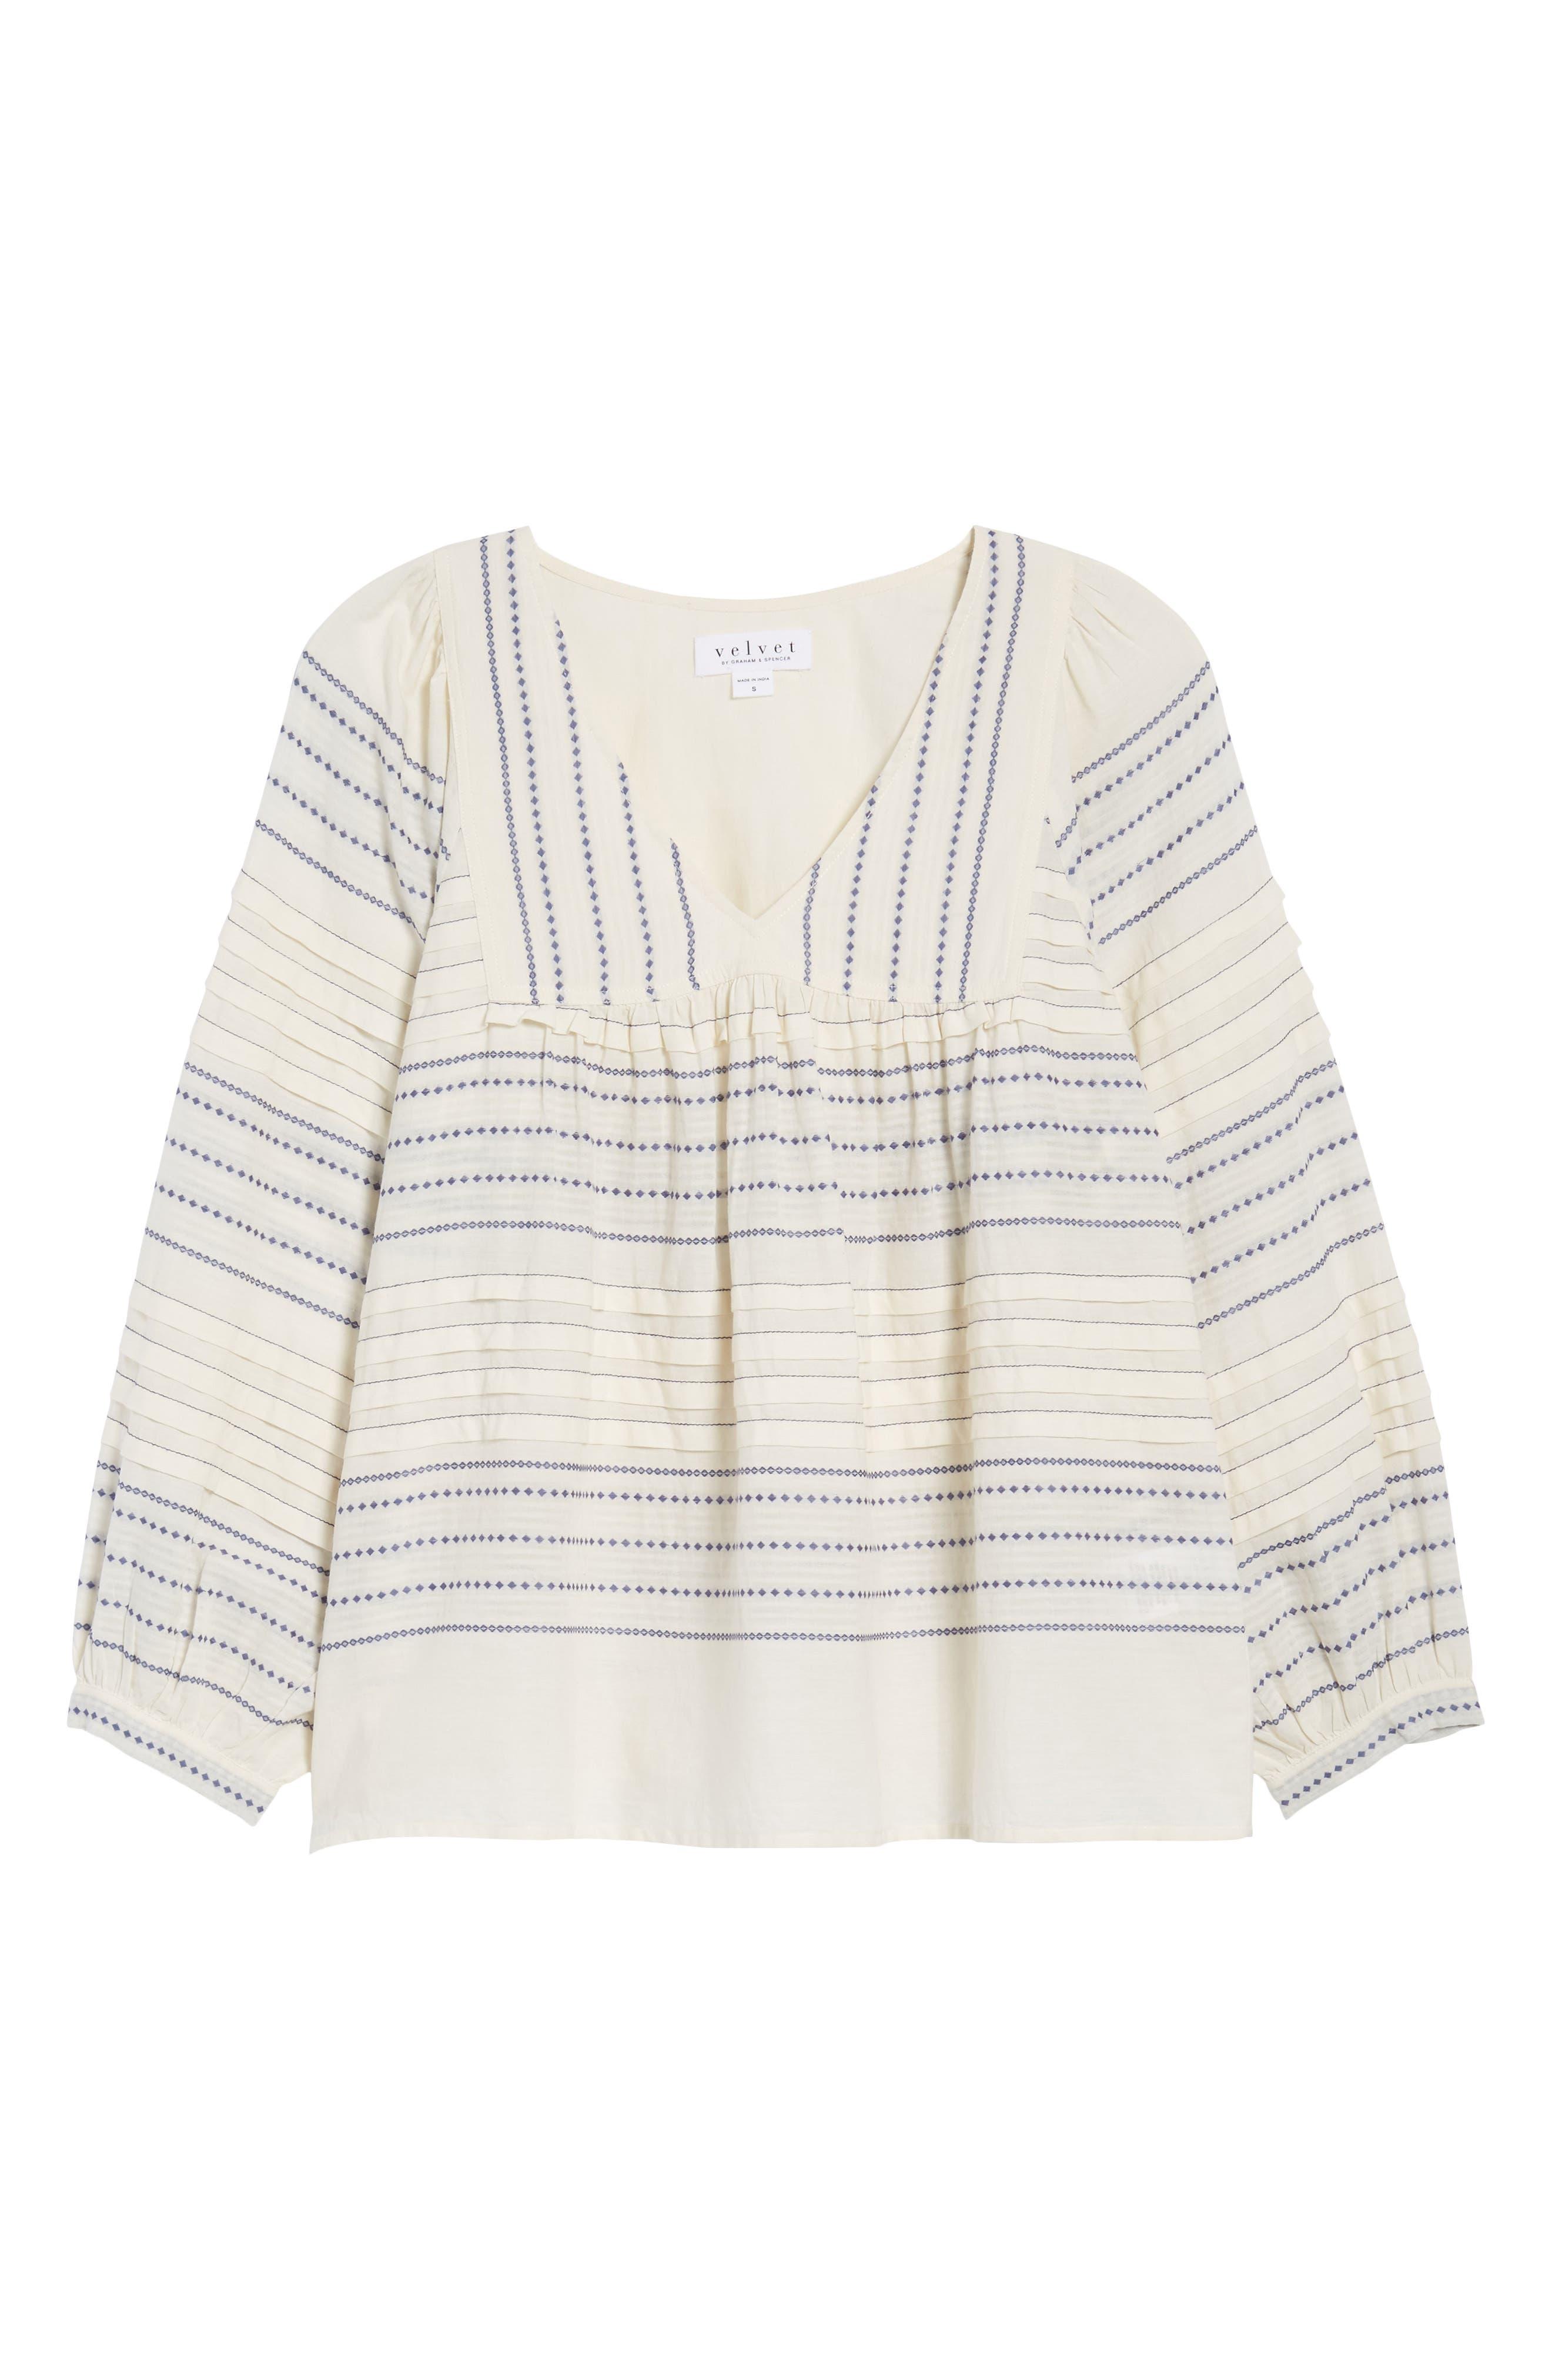 Paros Embroidered Cotton Peasant Blouse,                             Alternate thumbnail 6, color,                             906